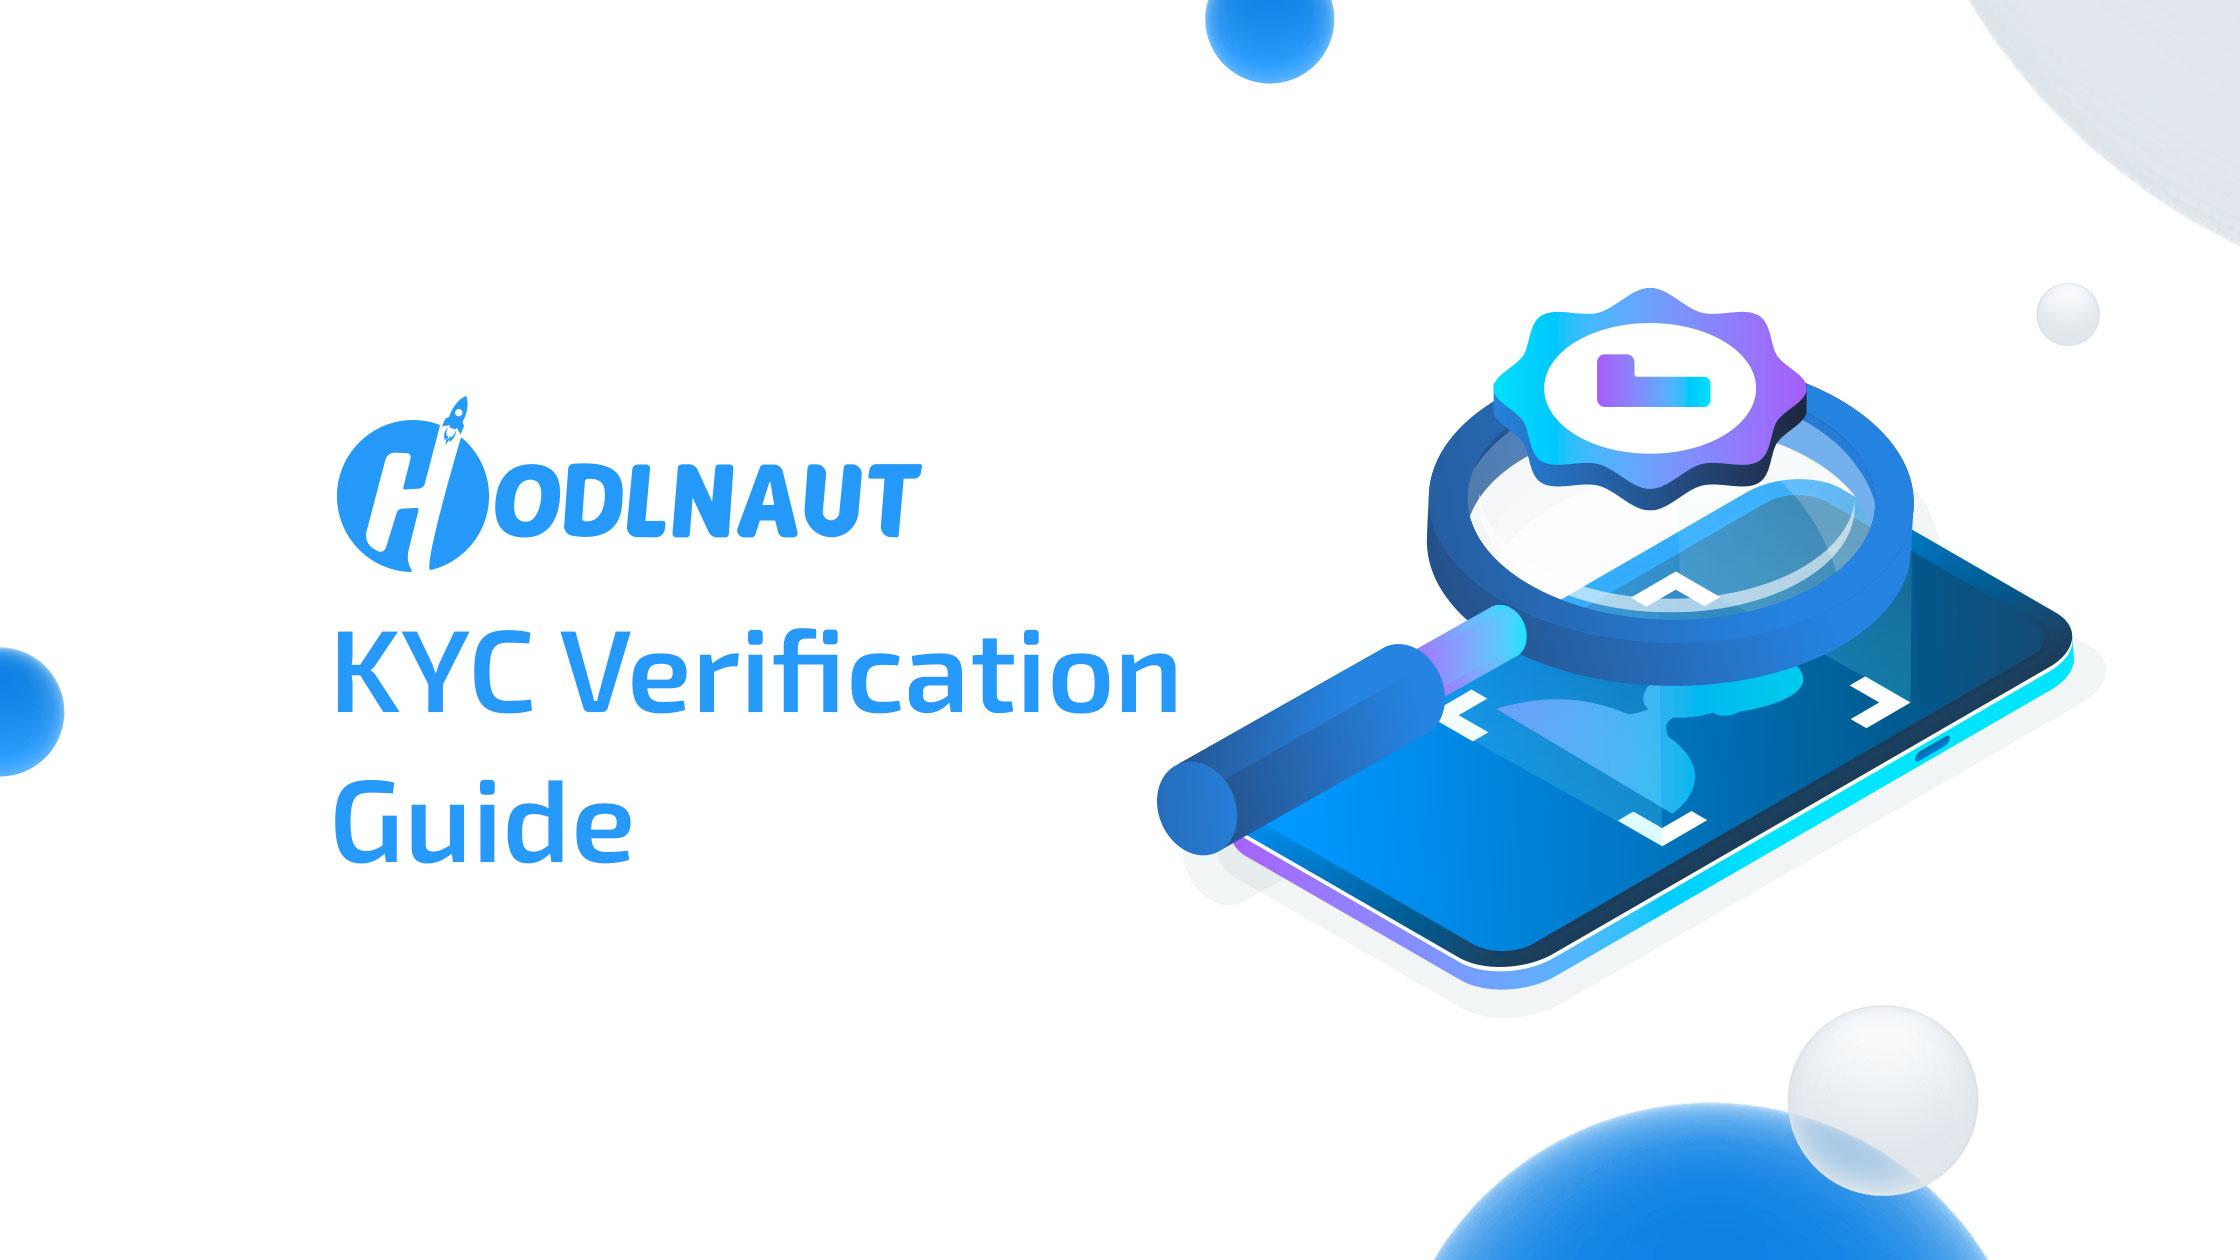 Hodlnaut KYC Verification Guide